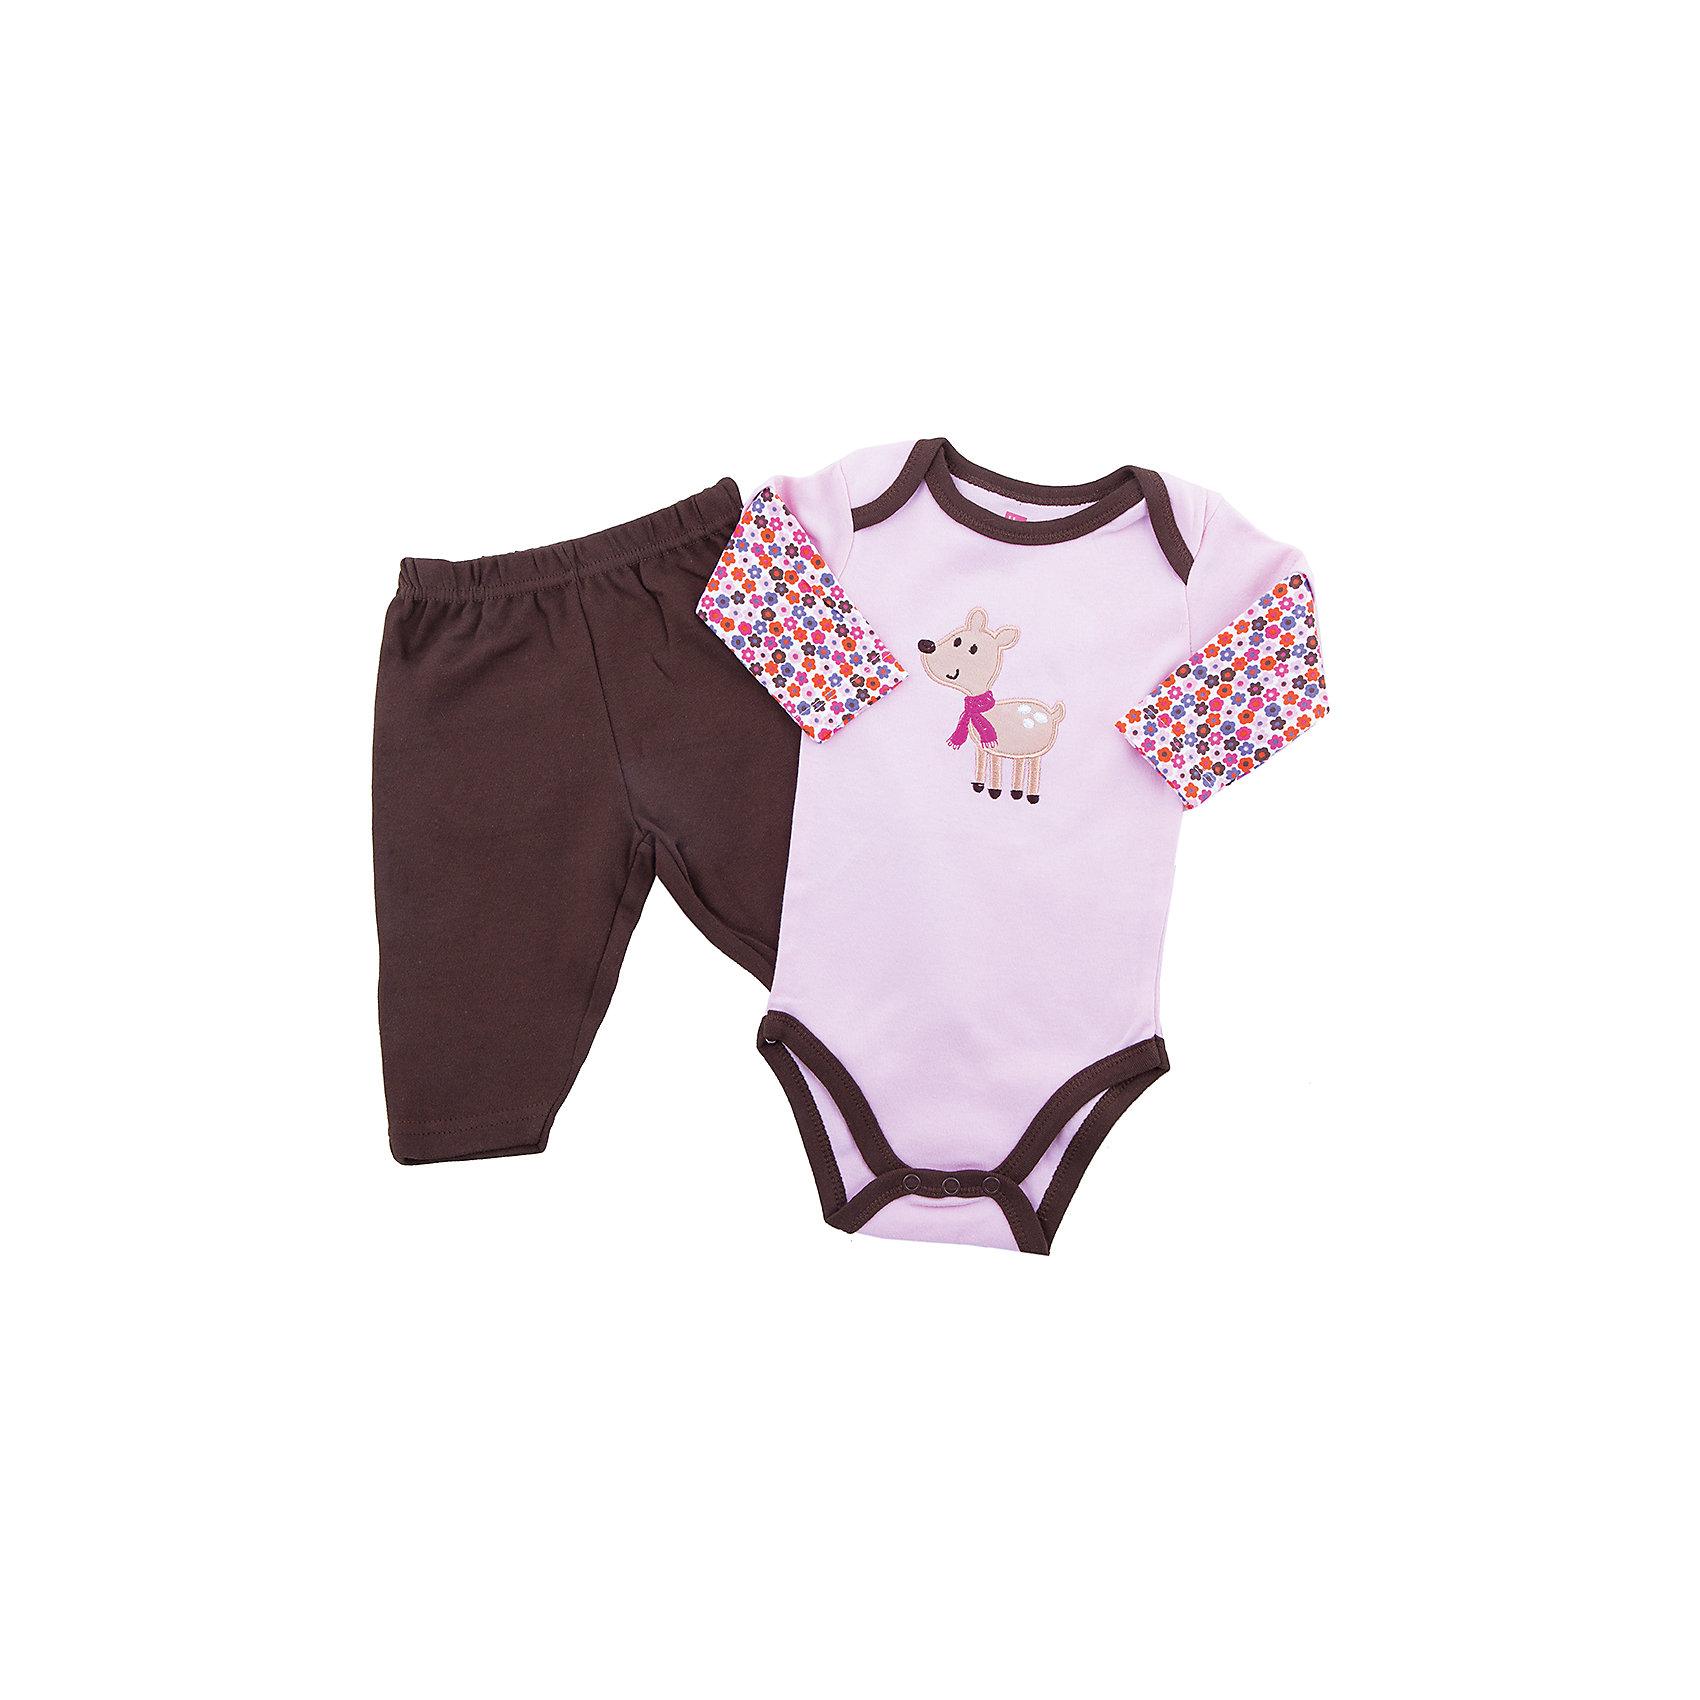 Hudson Baby Комплект для девочки: боди и штанишки для девочки Hudson Baby hudson baby детская